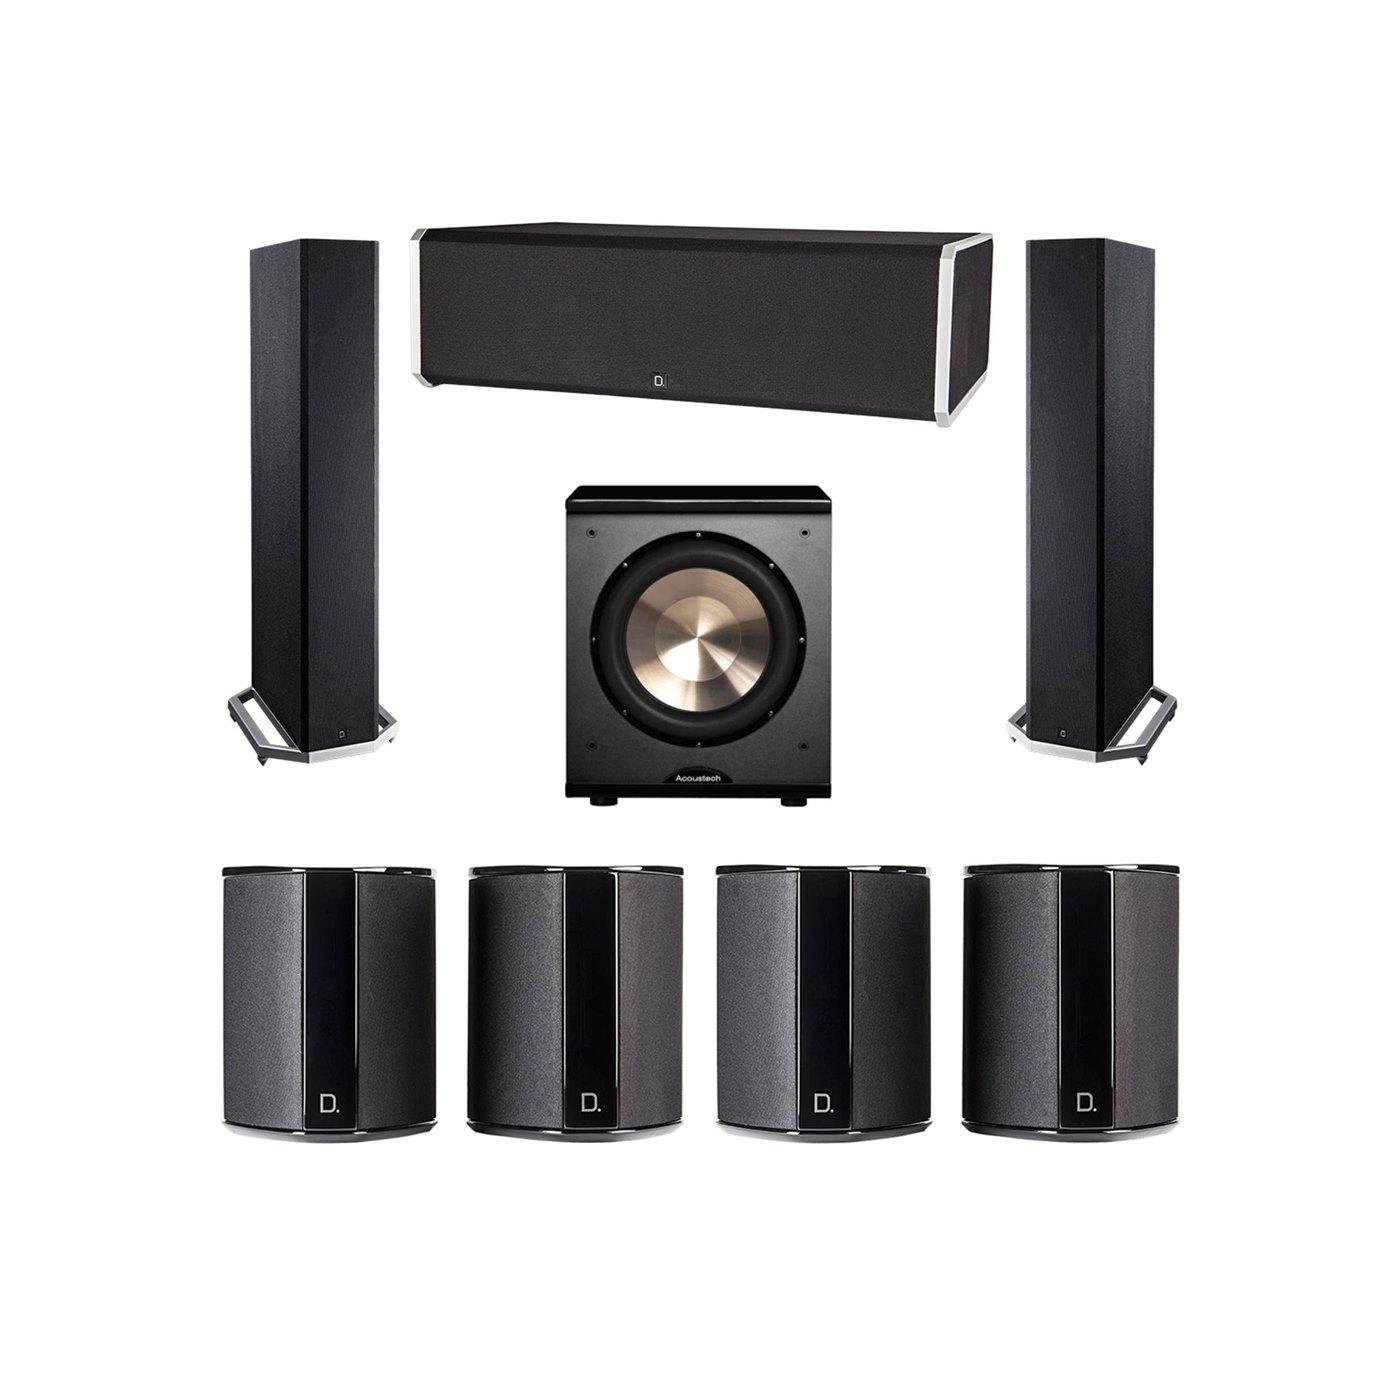 Definitive Technology 7.1 System with 2 BP9020 Tower Speakers, 1 CS9080 Center Channel Speaker, 4 SR9040 Surround Speaker, 1 BIC PL-200 Subwoofer